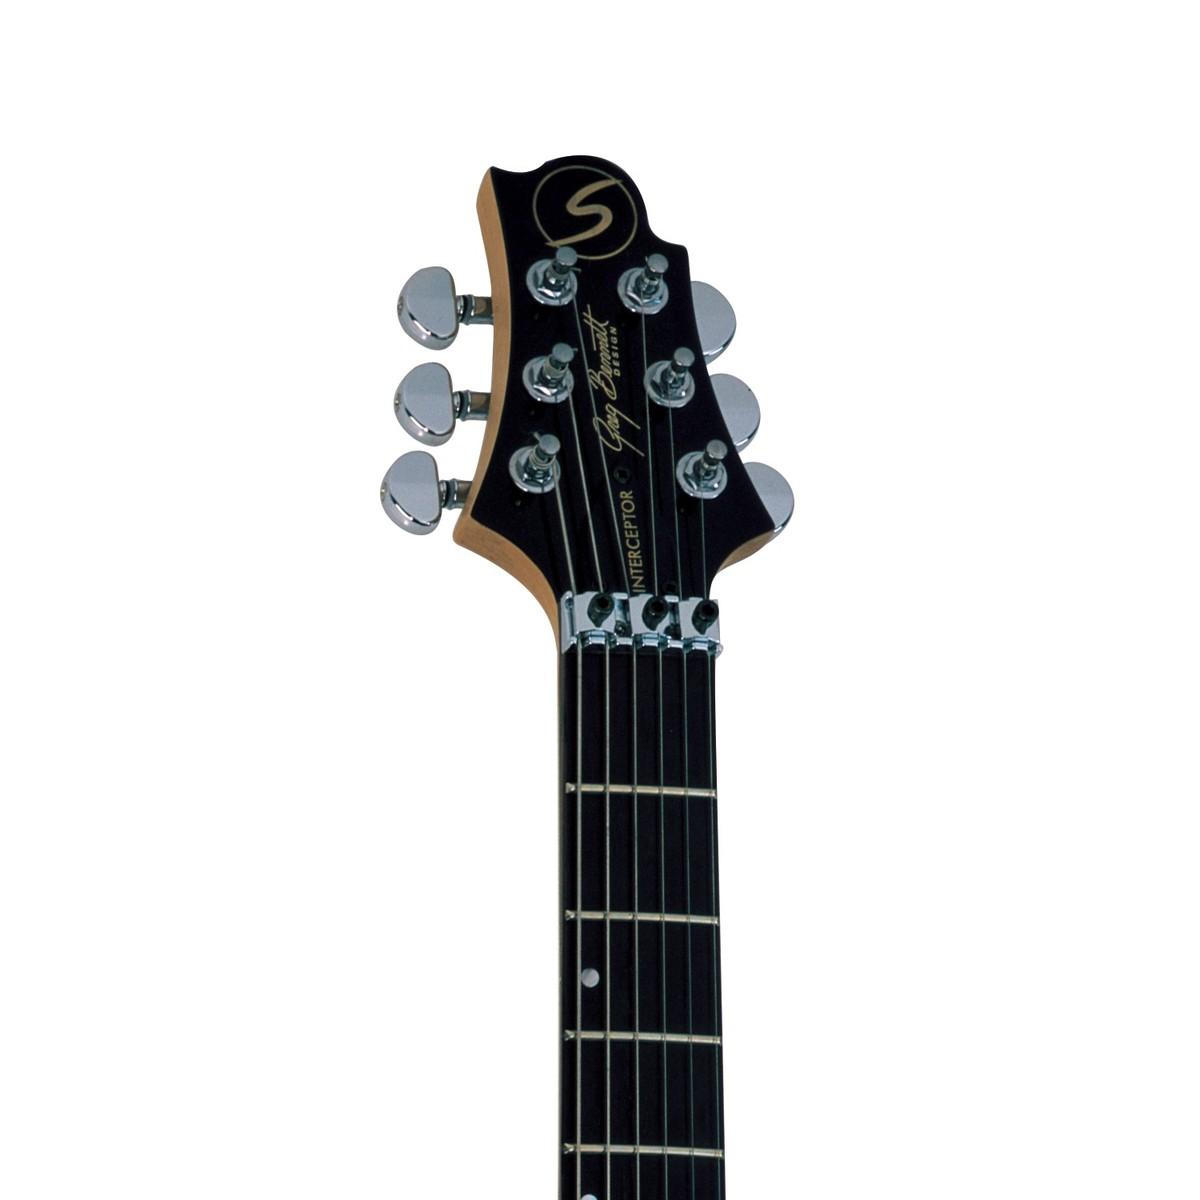 greg bennett interceptor ic-30 guitare electrique rouge transparent